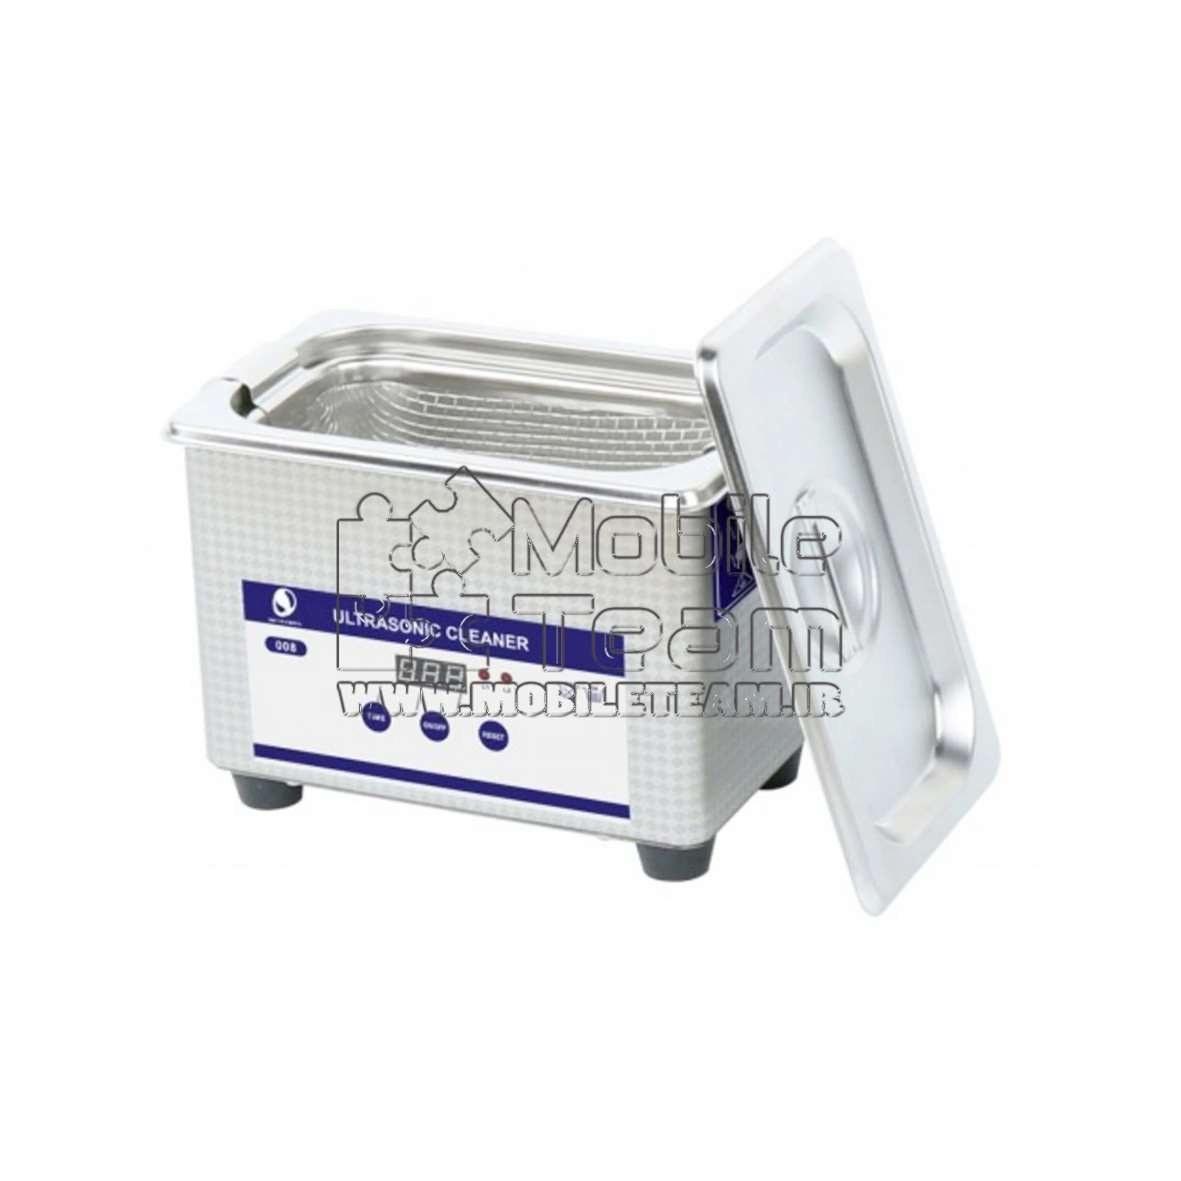 تصویر آلتراسونیک SS-6508T ا ULTRASONIC CLEANER SS-6508T ULTRASONIC CLEANER SS-6508T